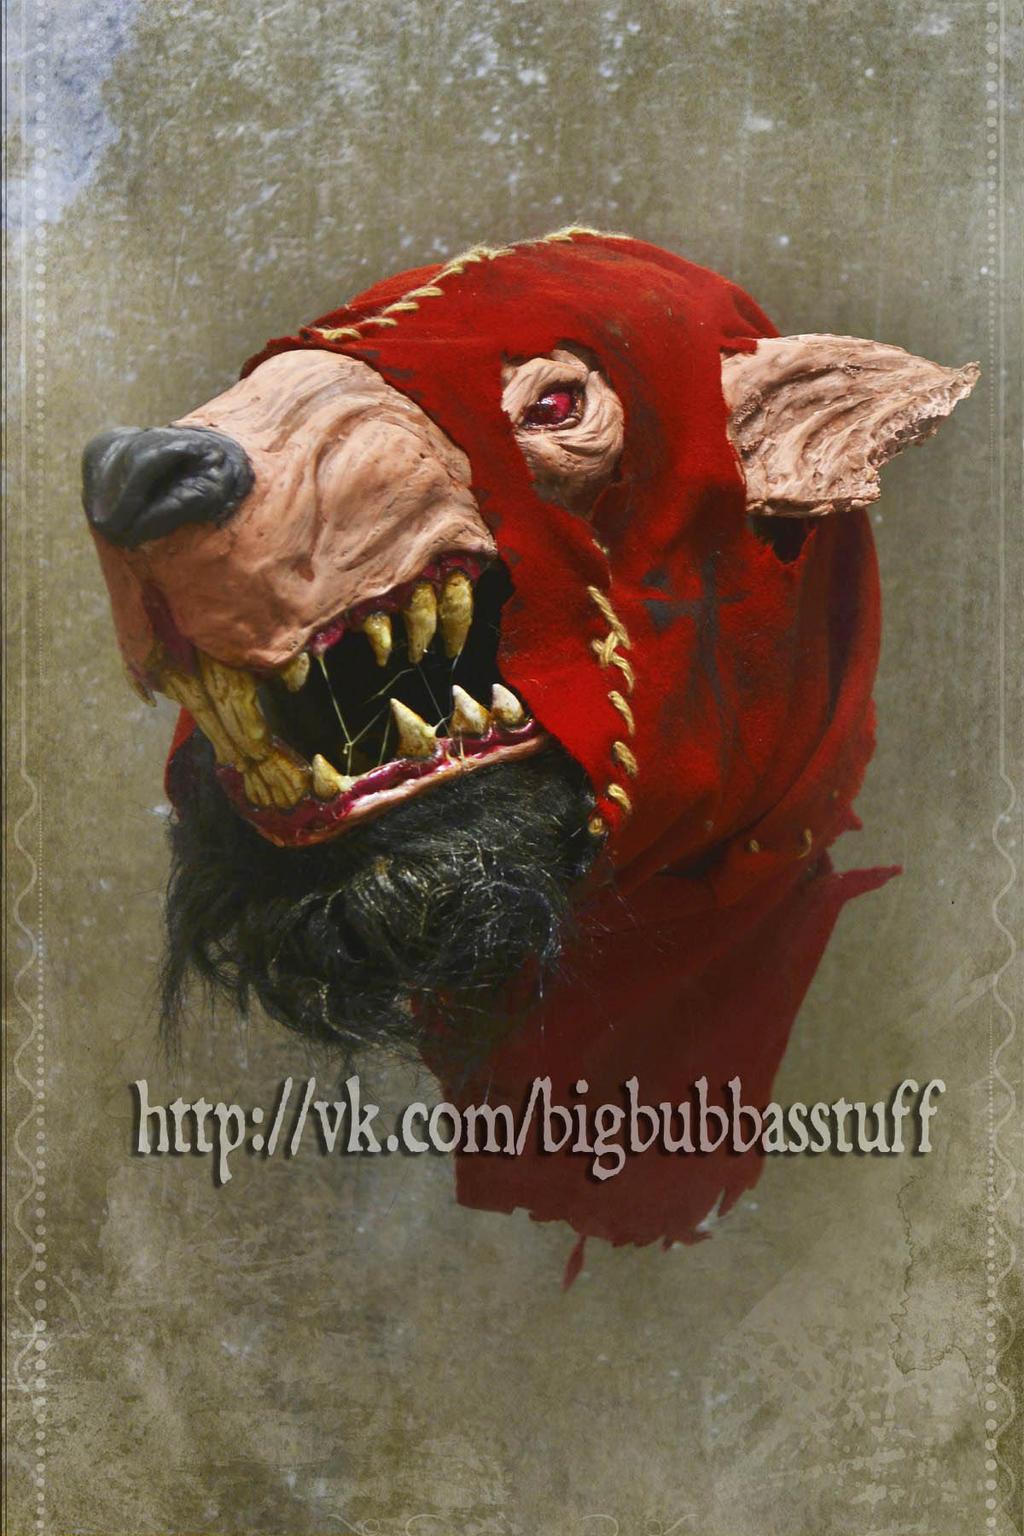 Warhammer Skaven clanrat by BIGBUBBASSTUFF